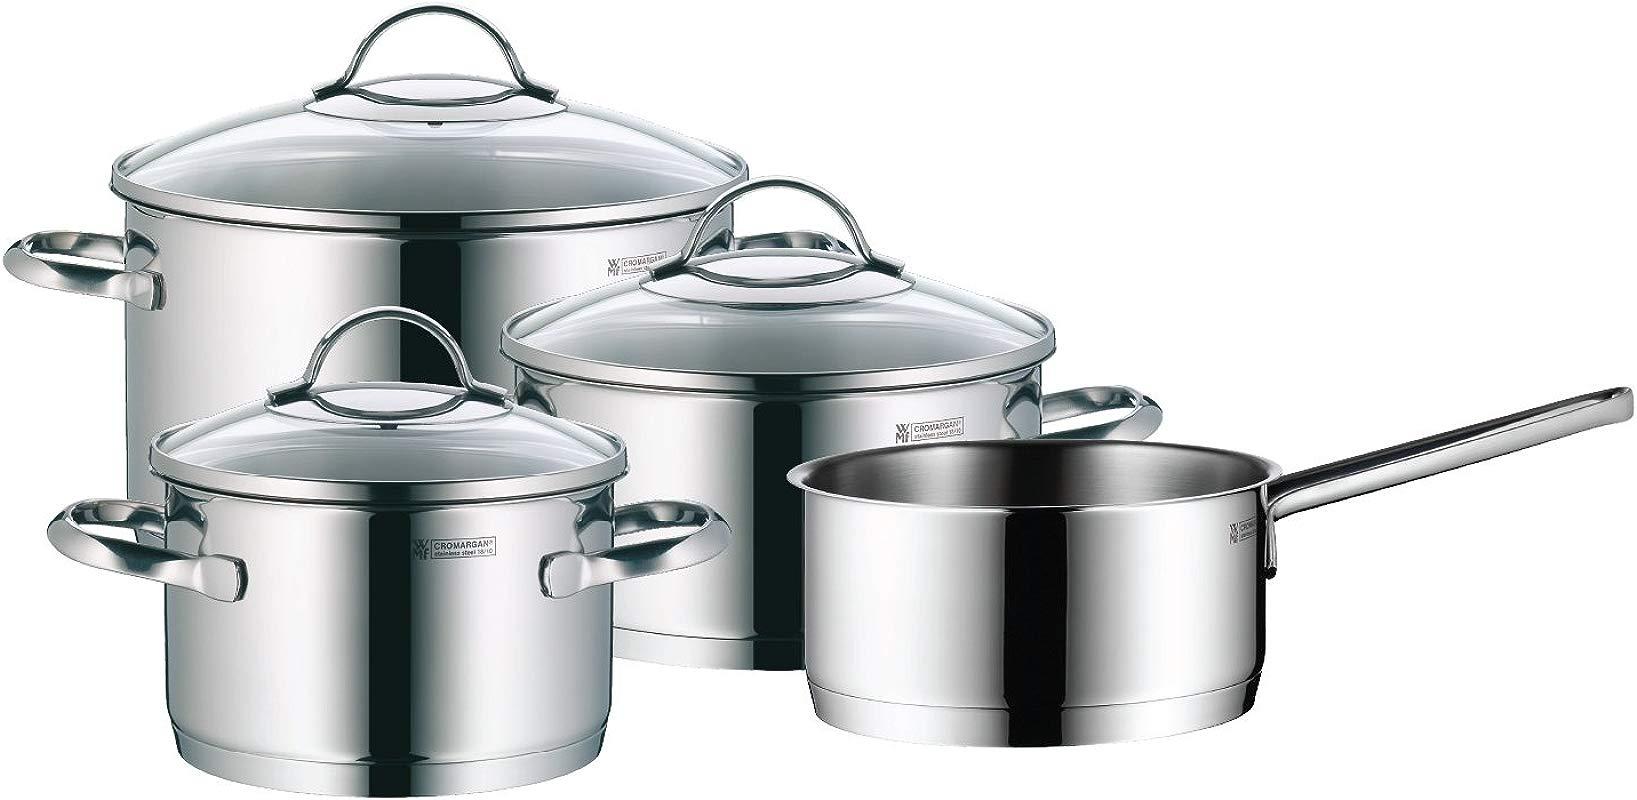 WMF Provence Plus 7 Piece Cookware Set